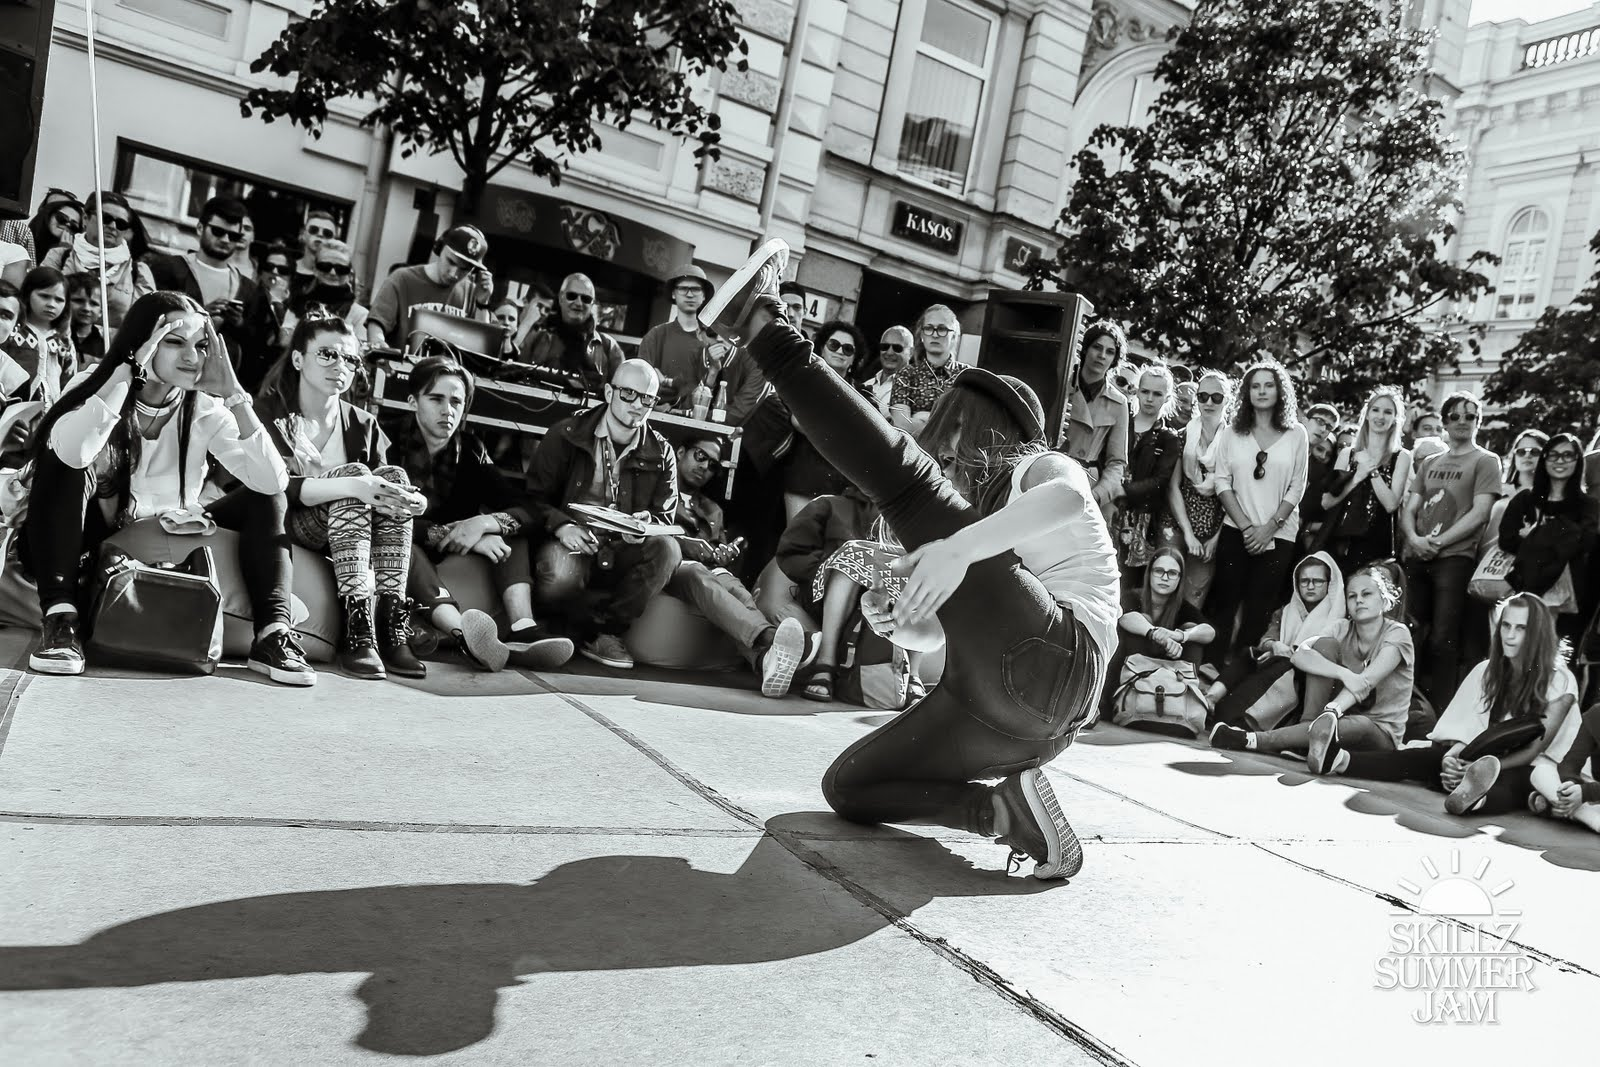 SKILLZ Summer Jam 2015 - xIMG_0507.jpg